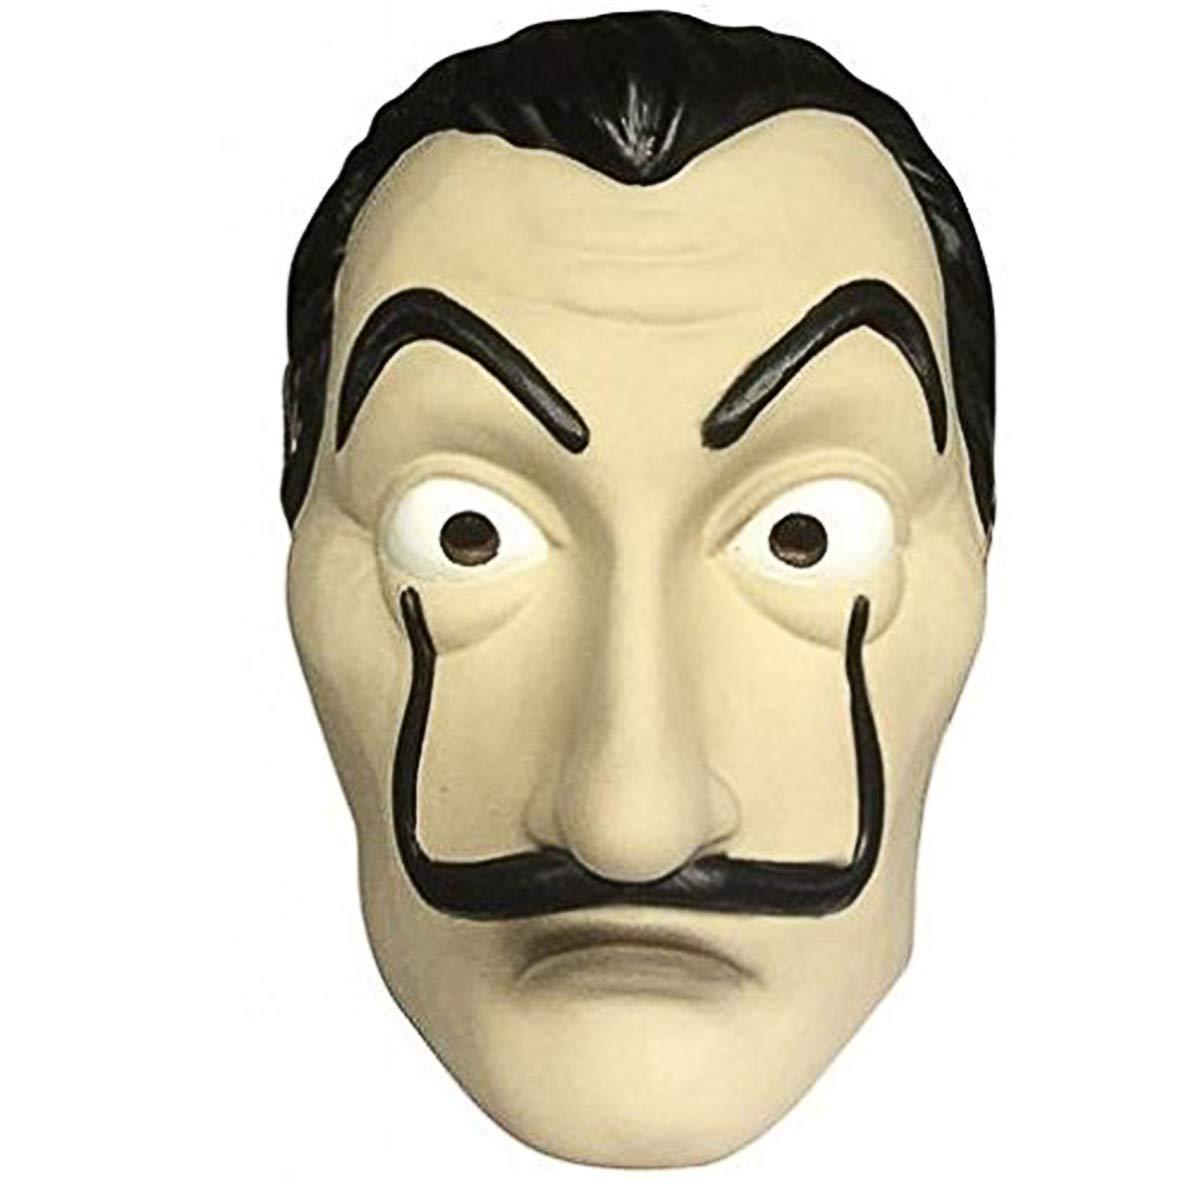 La Casa De Papel//Money Heist Maschera e Abbigliamento di Salvador Dal/í HOMELEX Maschera per Festa di Halloween